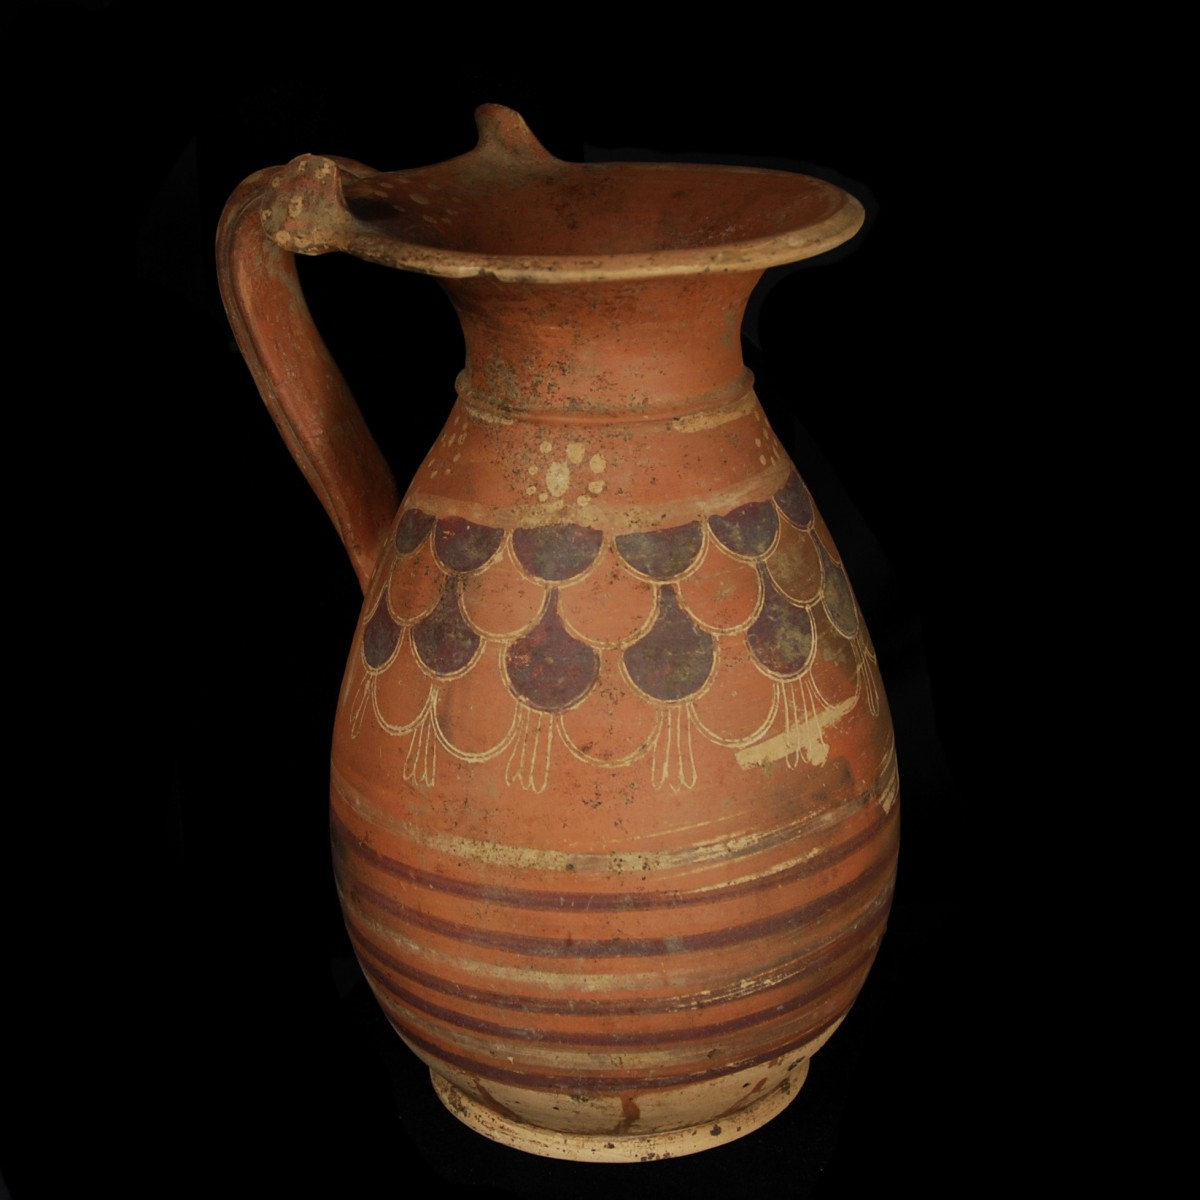 Etrusco-corinthian olpe